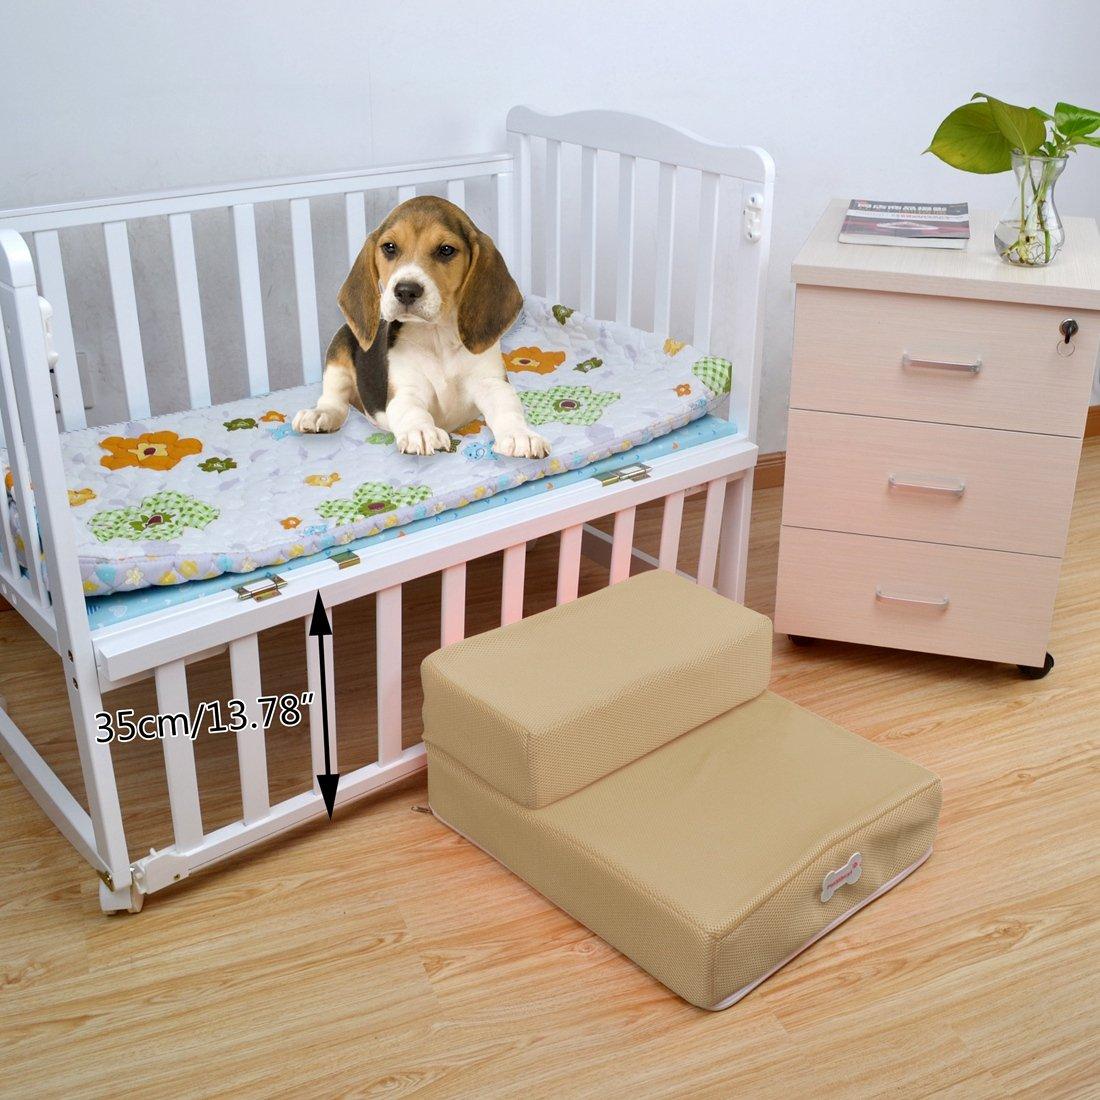 Jiyaru Pet Stairs Dog Cat Breathable 2-Step Ramp Folding Ladder Puppy Supplies Gray